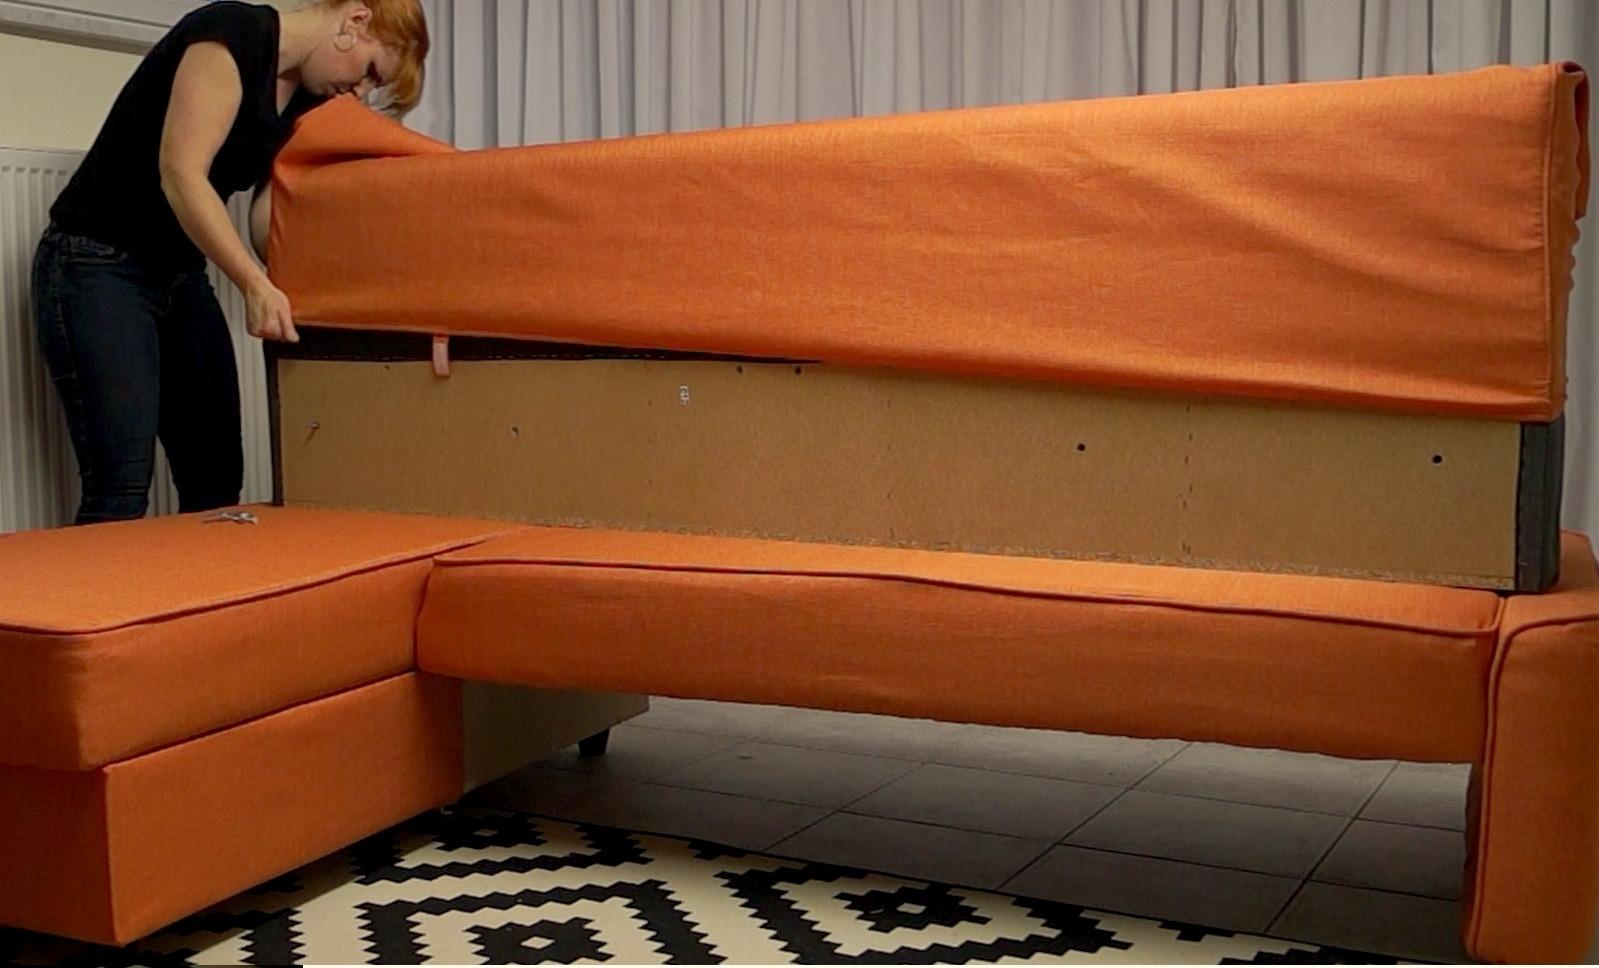 solsta sofa bed ransta dark gray review seattle rooms to go how disassemble ikea friheten ideas